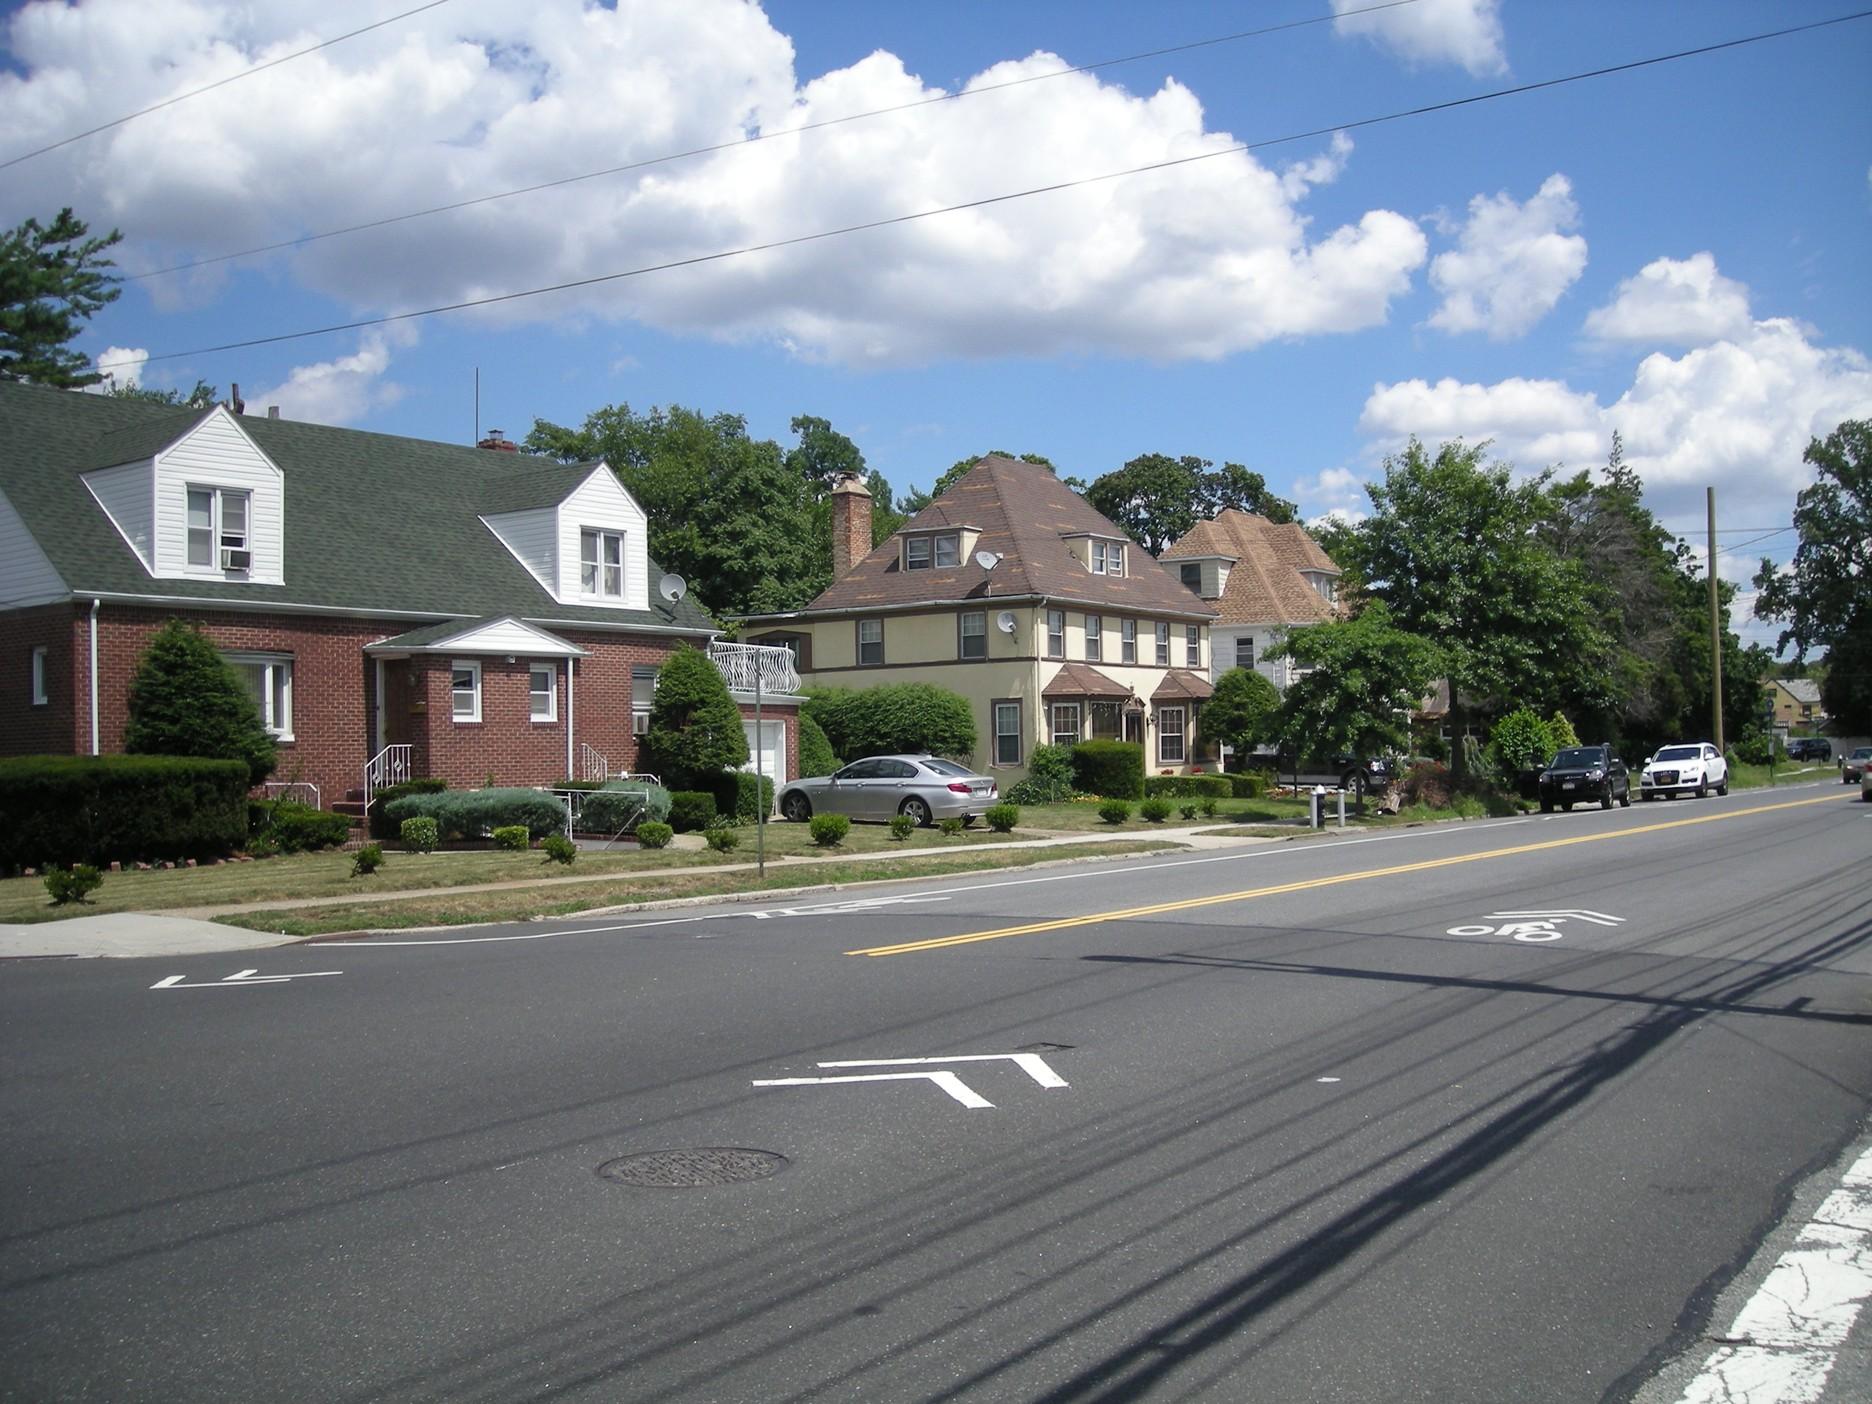 20150426_124211 The Next Hottest Neighborhood In NYC Is... Jamaica, Queens ?-garbage